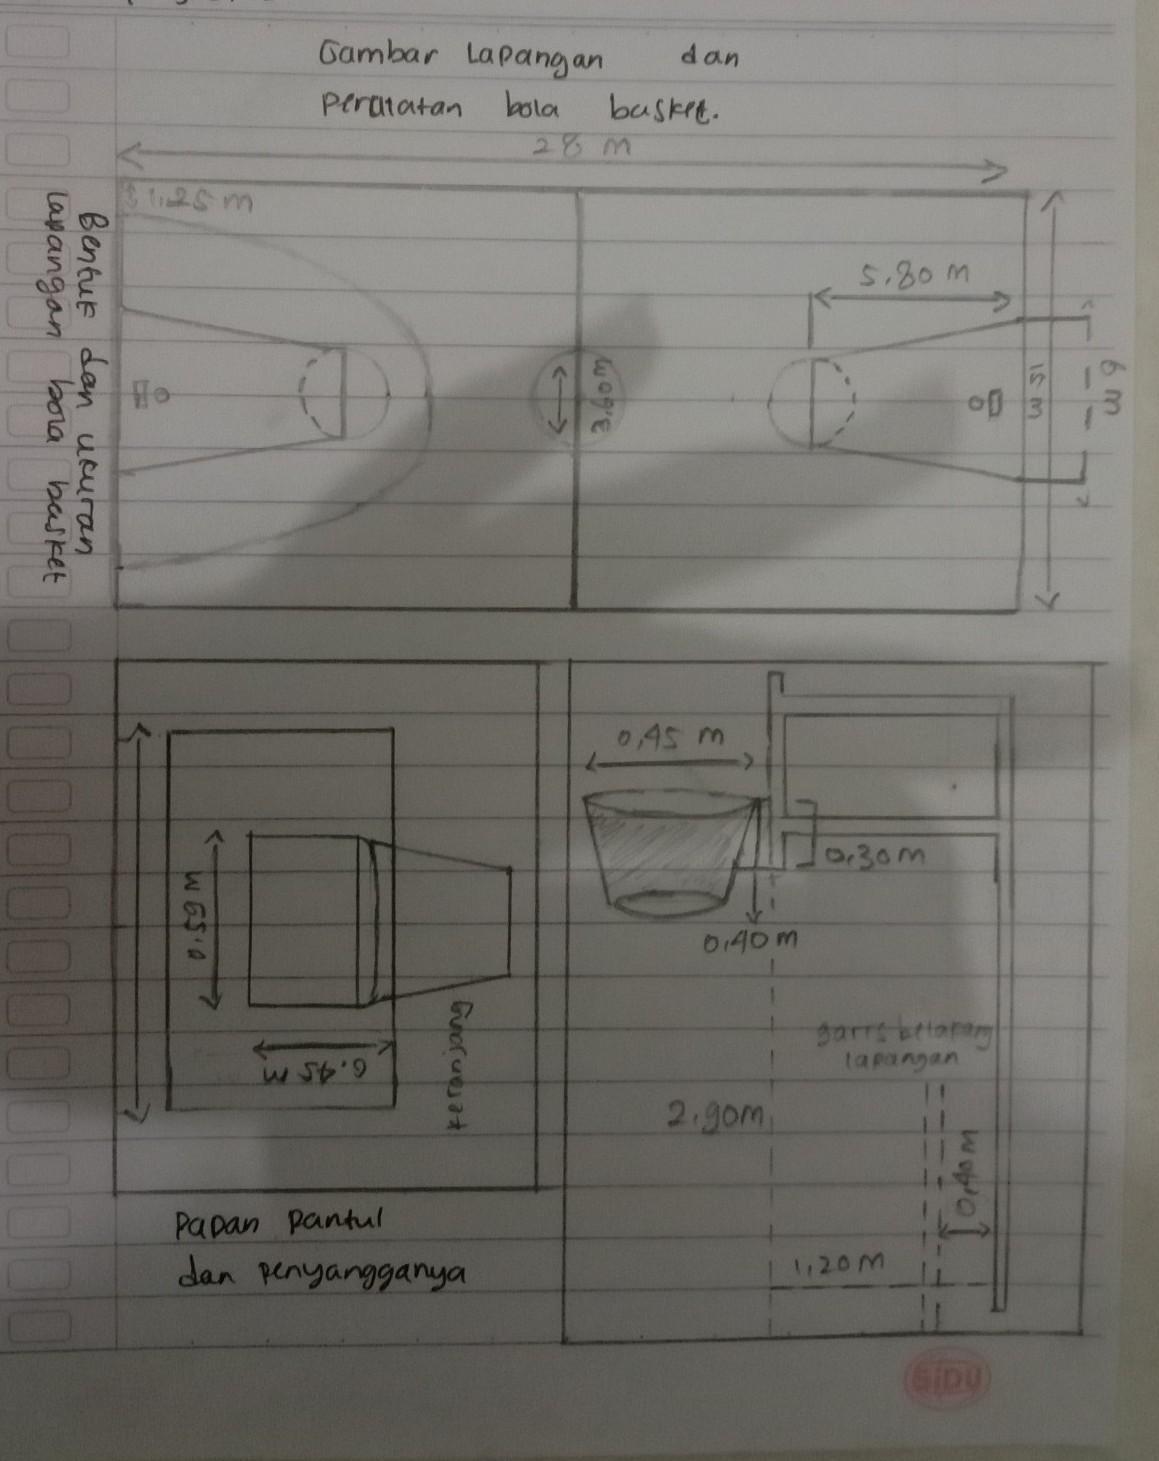 Gambar Lapangan Basket Beserta Ukuran : gambar, lapangan, basket, beserta, ukuran, Buatlah, Lapangan, Basket, Beserta, Ukurannya!, Brainly.co.id